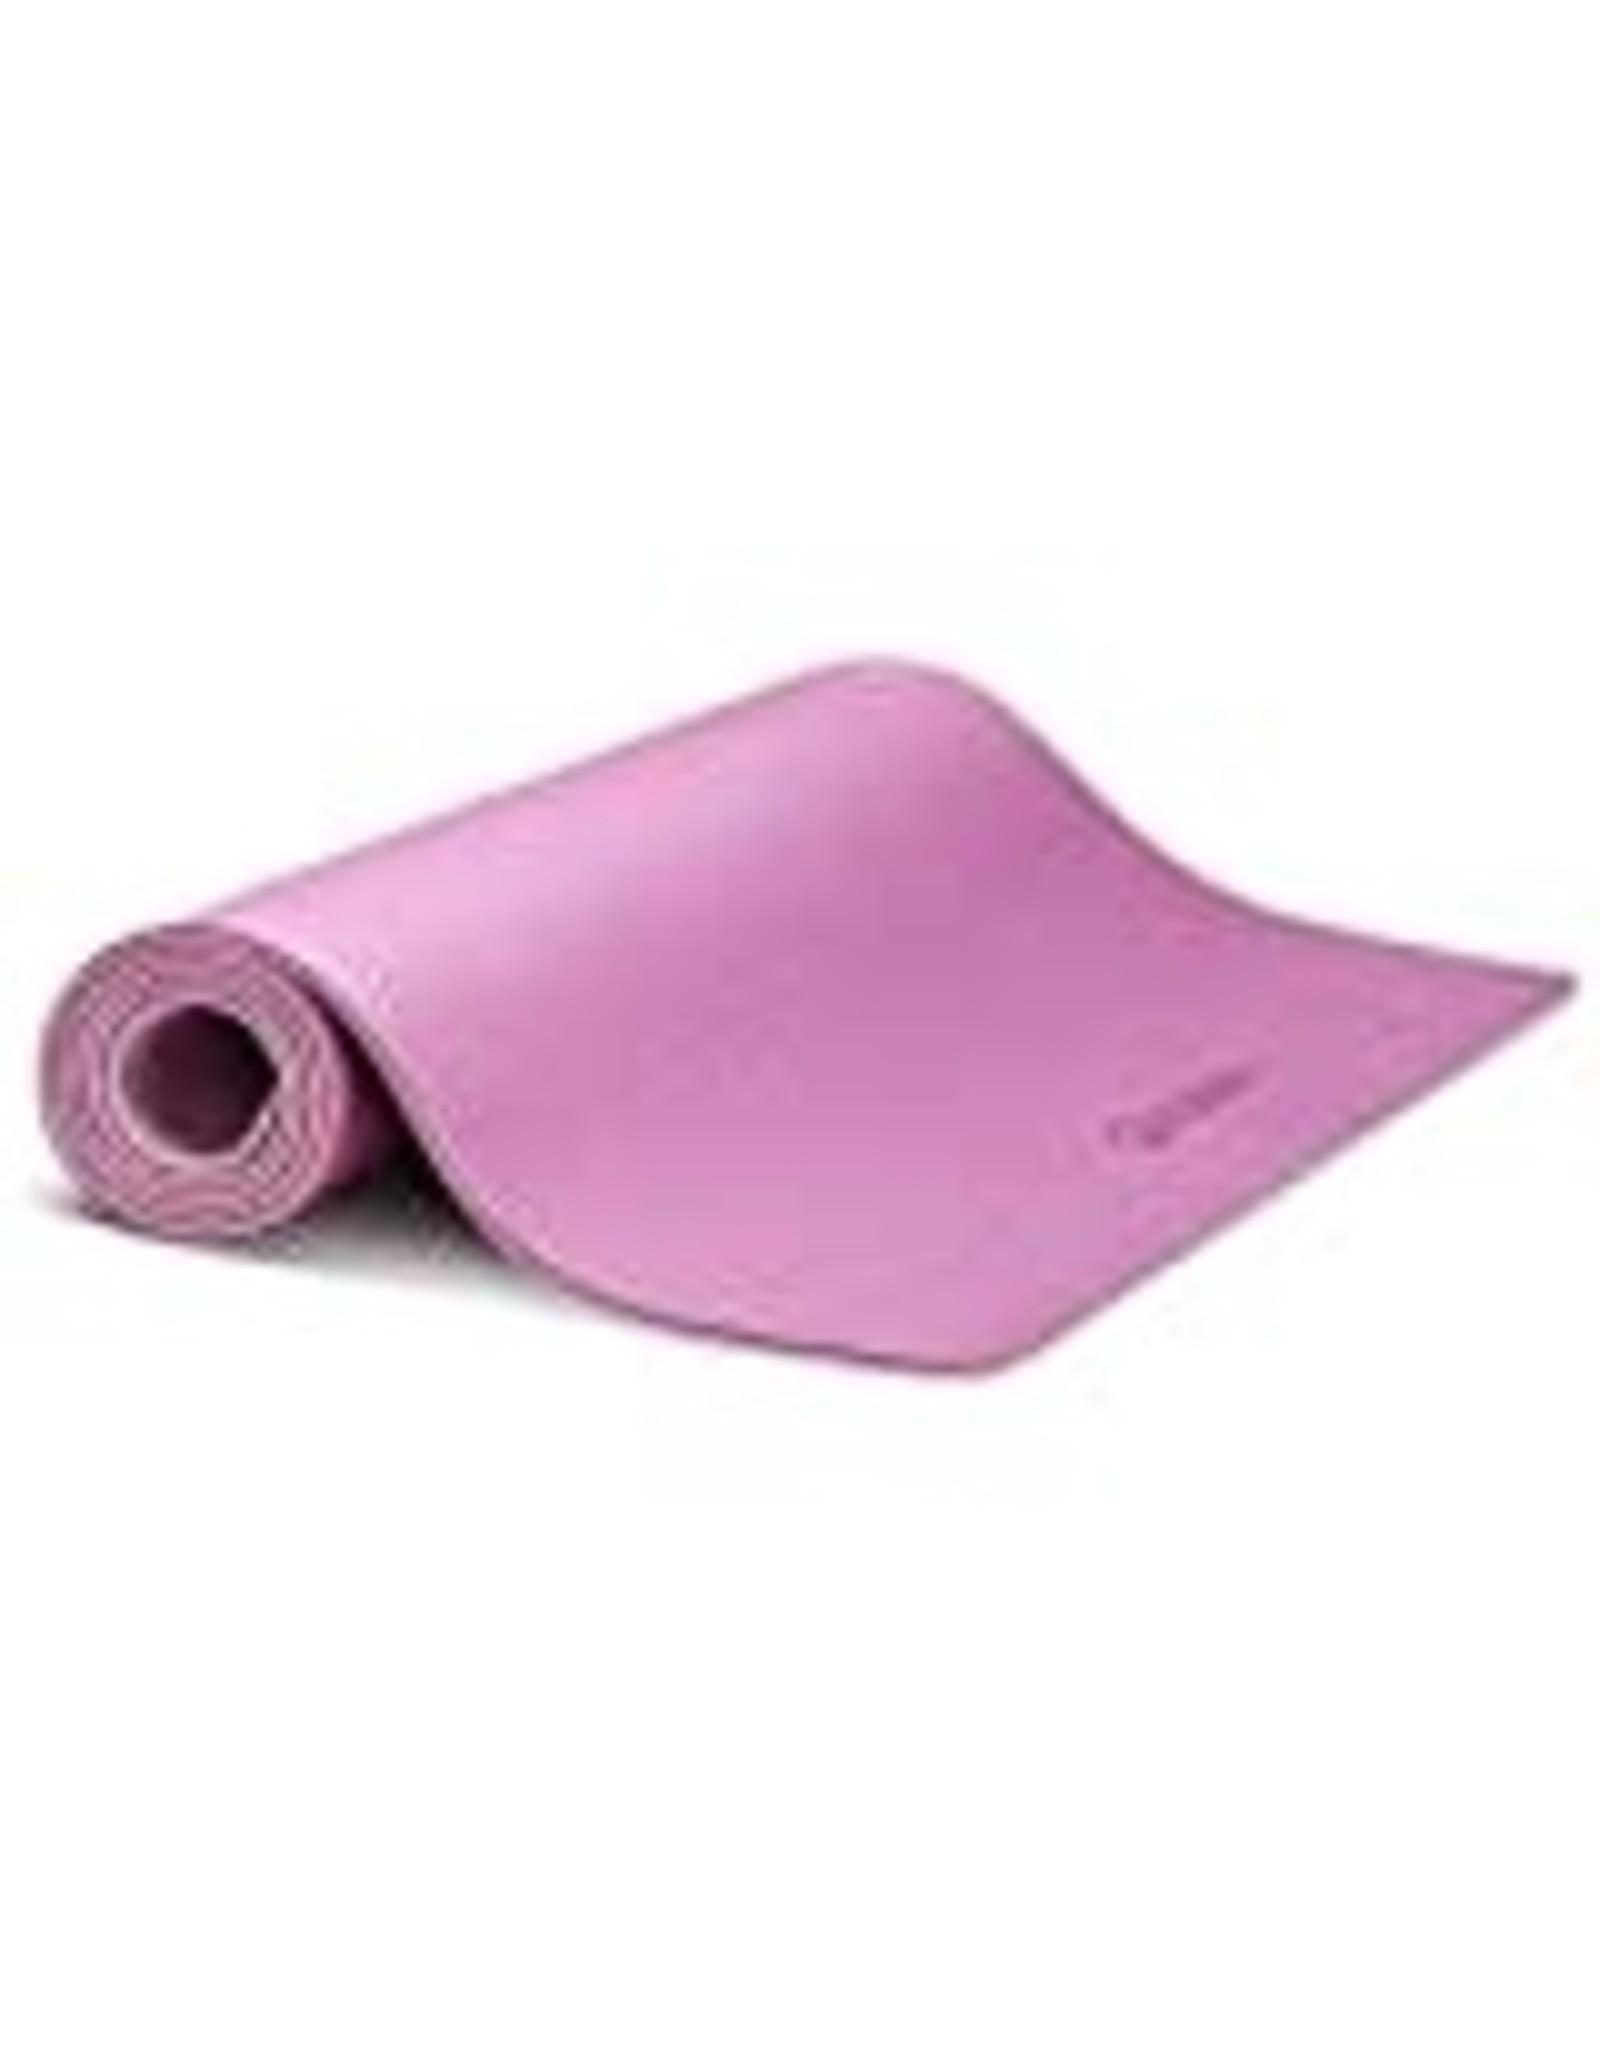 "My Favorite Yoga Mat 24"" x 68"" 5MM thick"